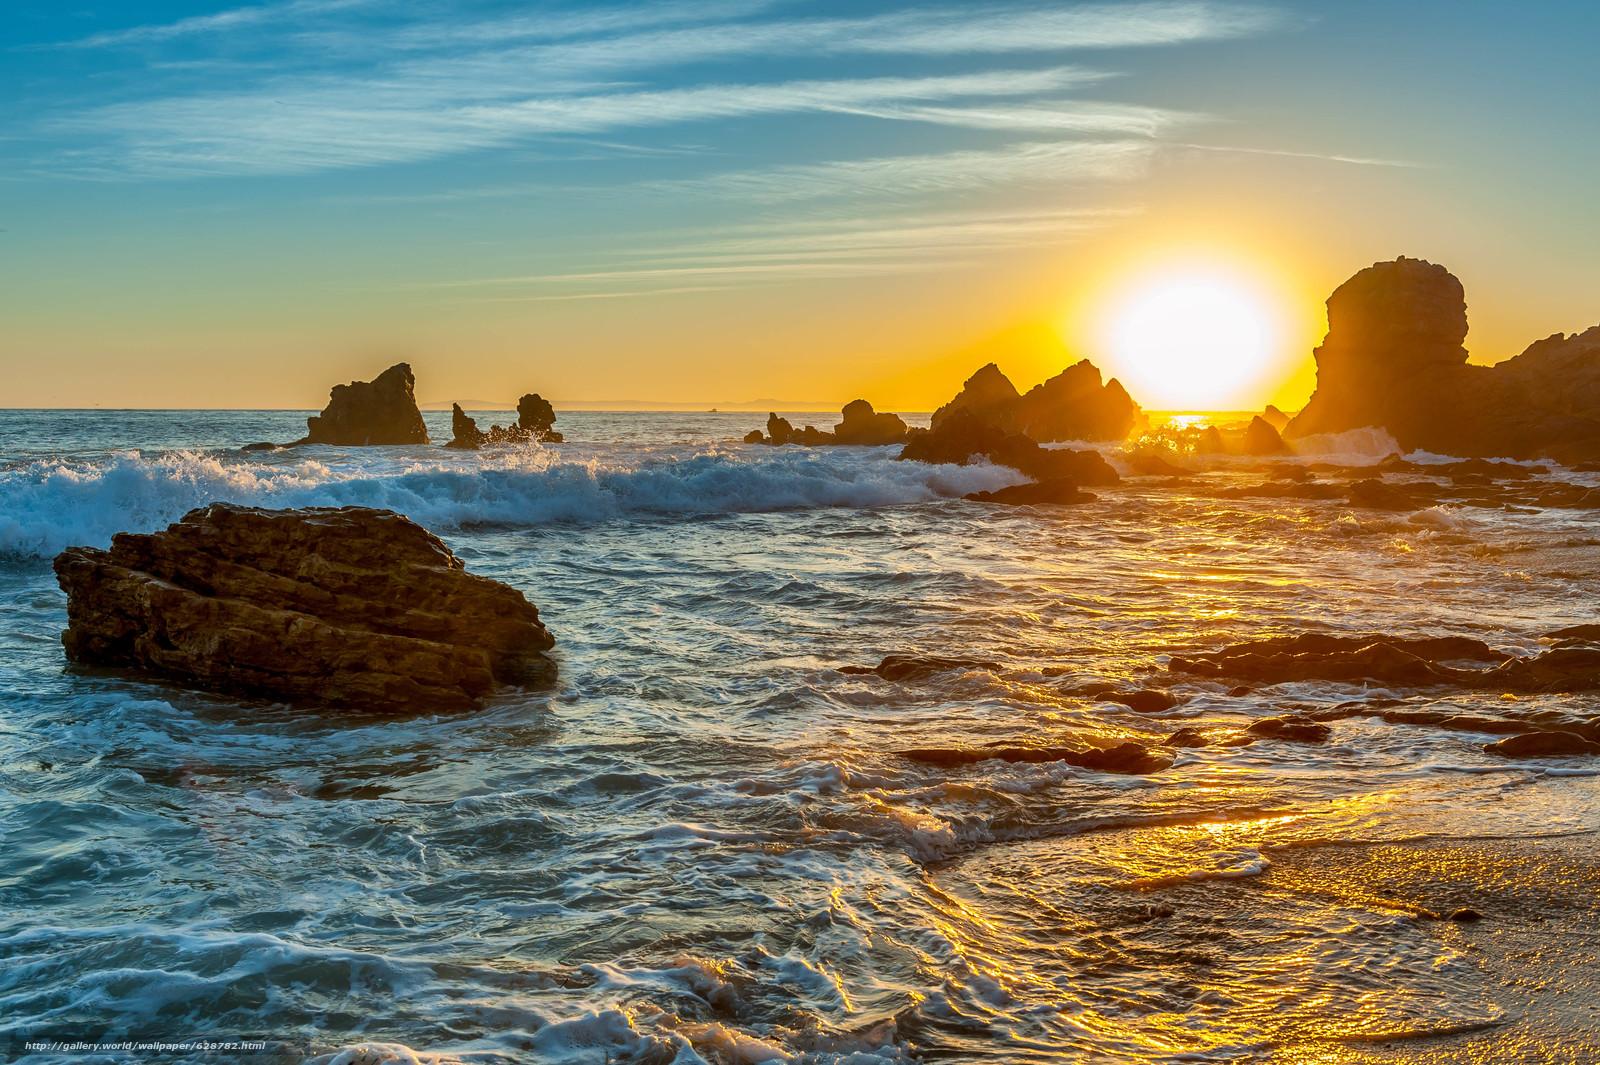 море, закат, волны, скалы, пейзаж